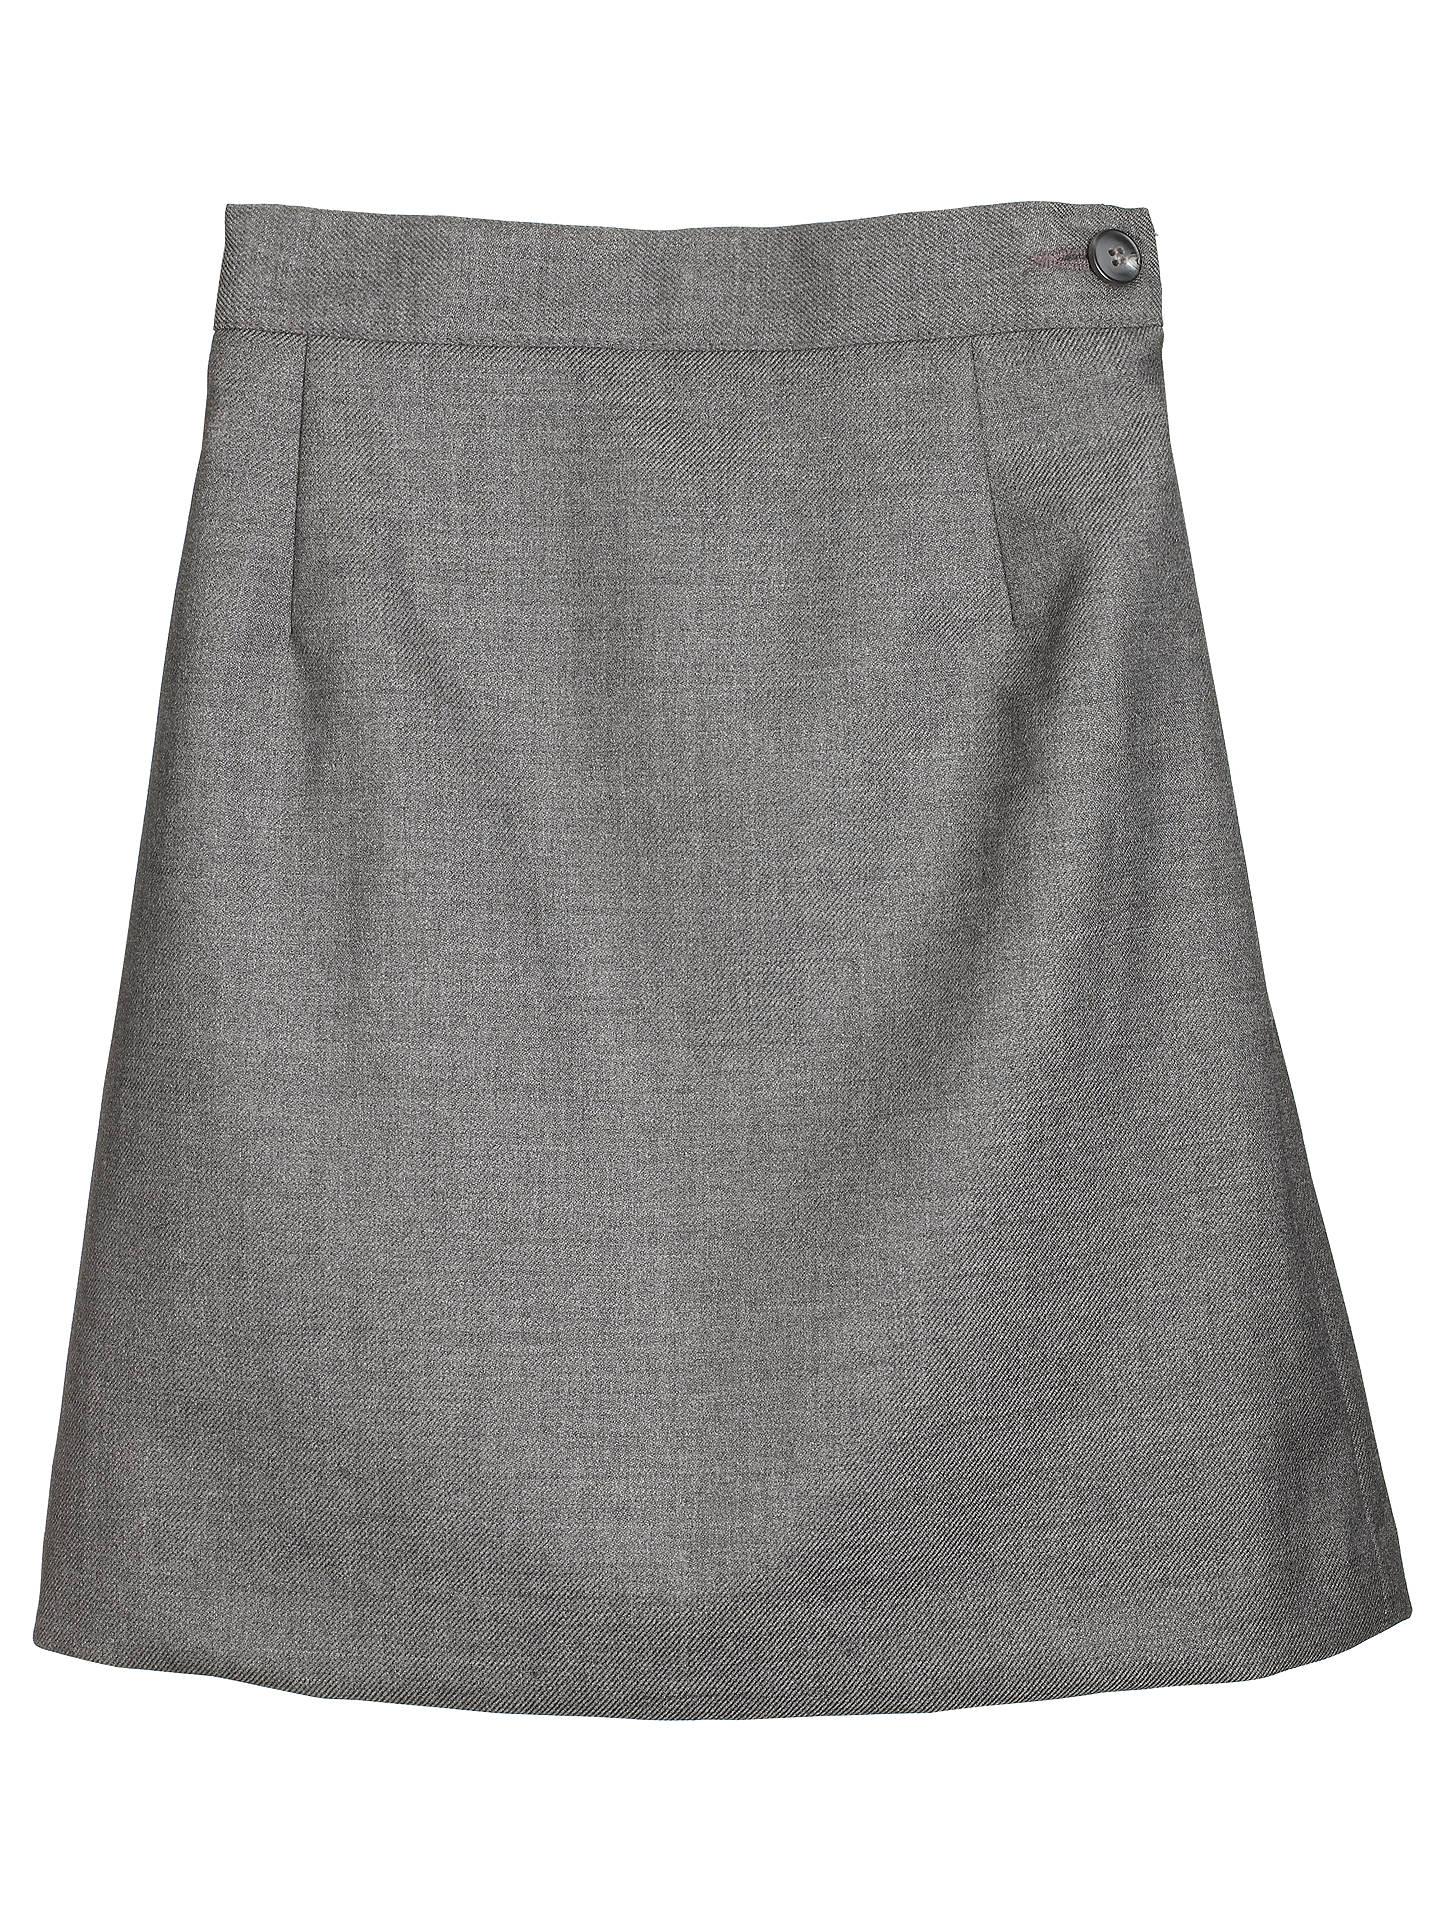 6411855f64f23 Girls' School Wool Mix Pencil Skirt, Grey at John Lewis & Partners